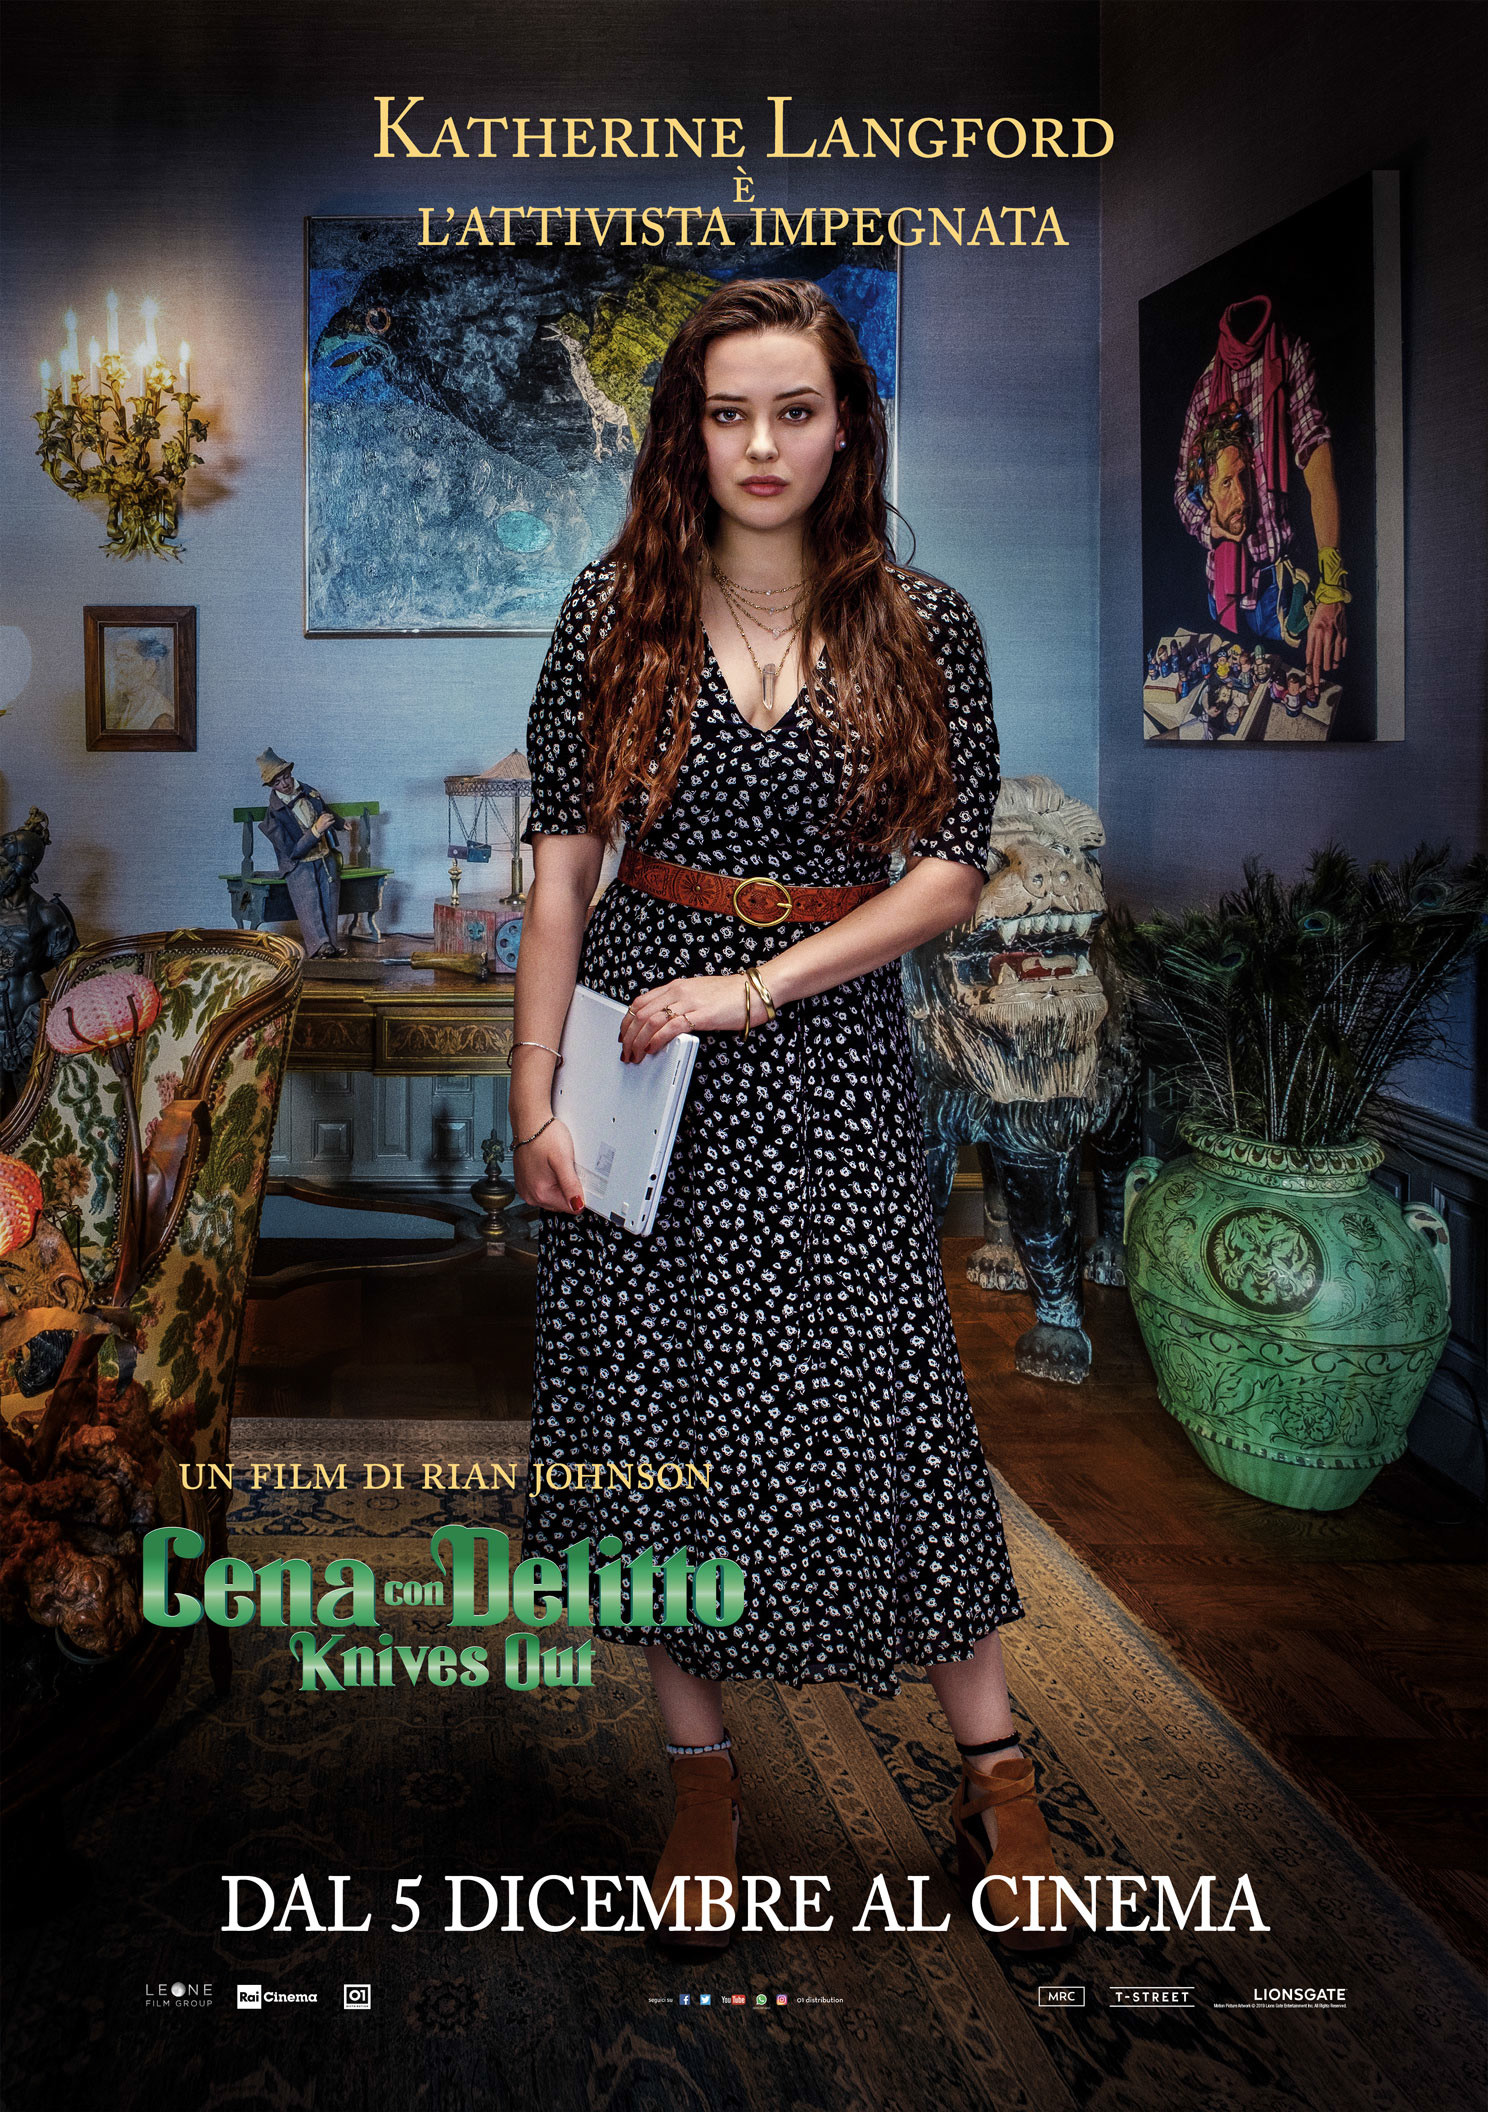 Katherine Langford Poster